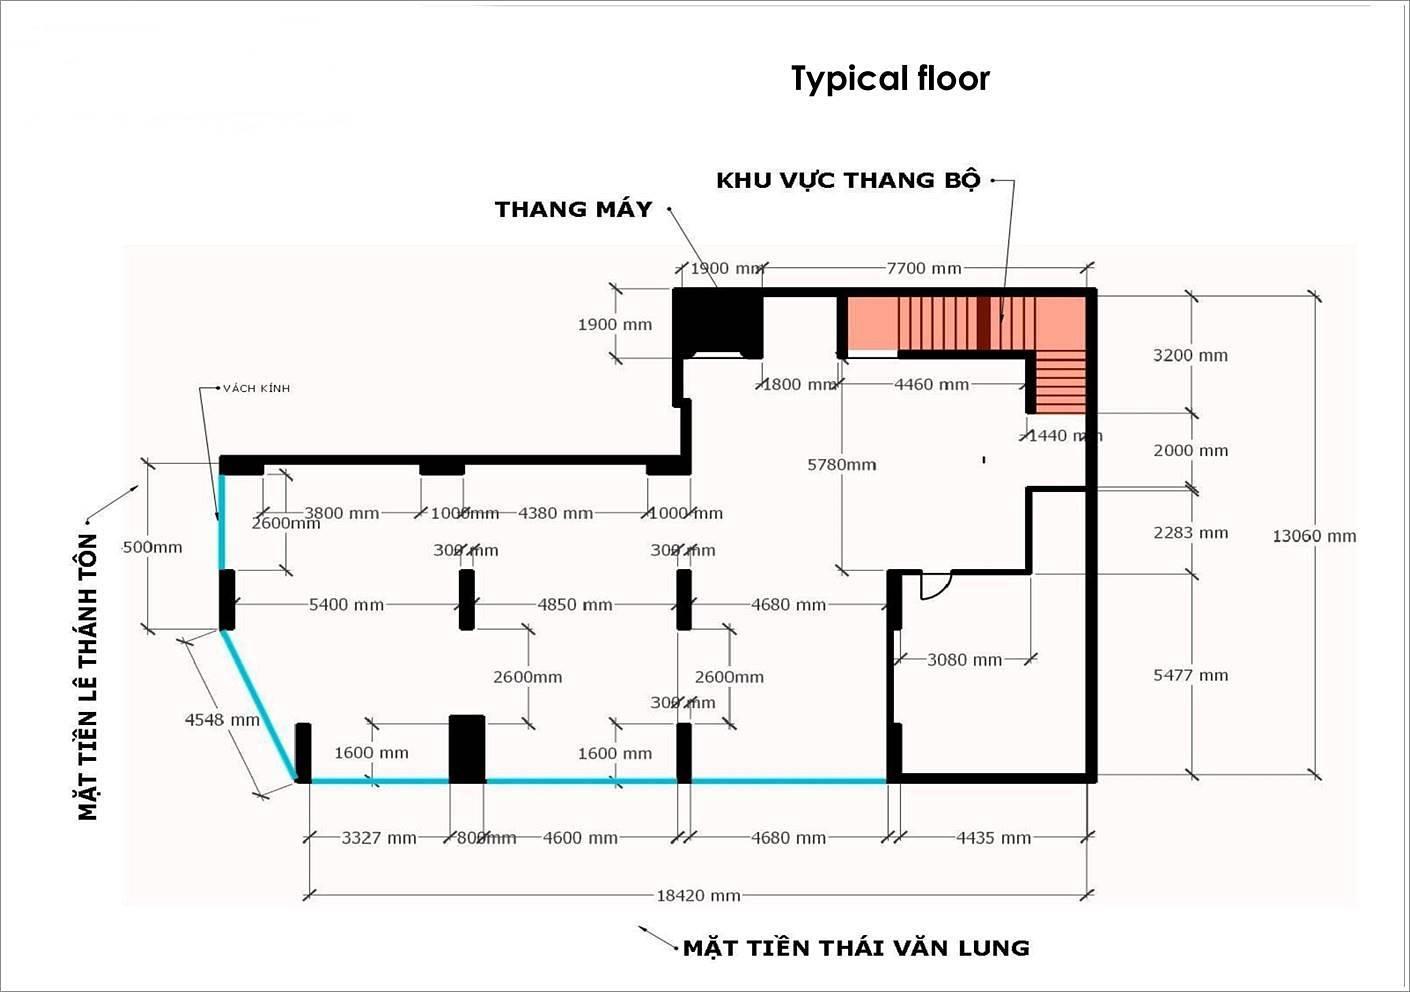 10ab-building-thai-van-lung-quan-1-van-phong-cho-thue-5real.vn-02